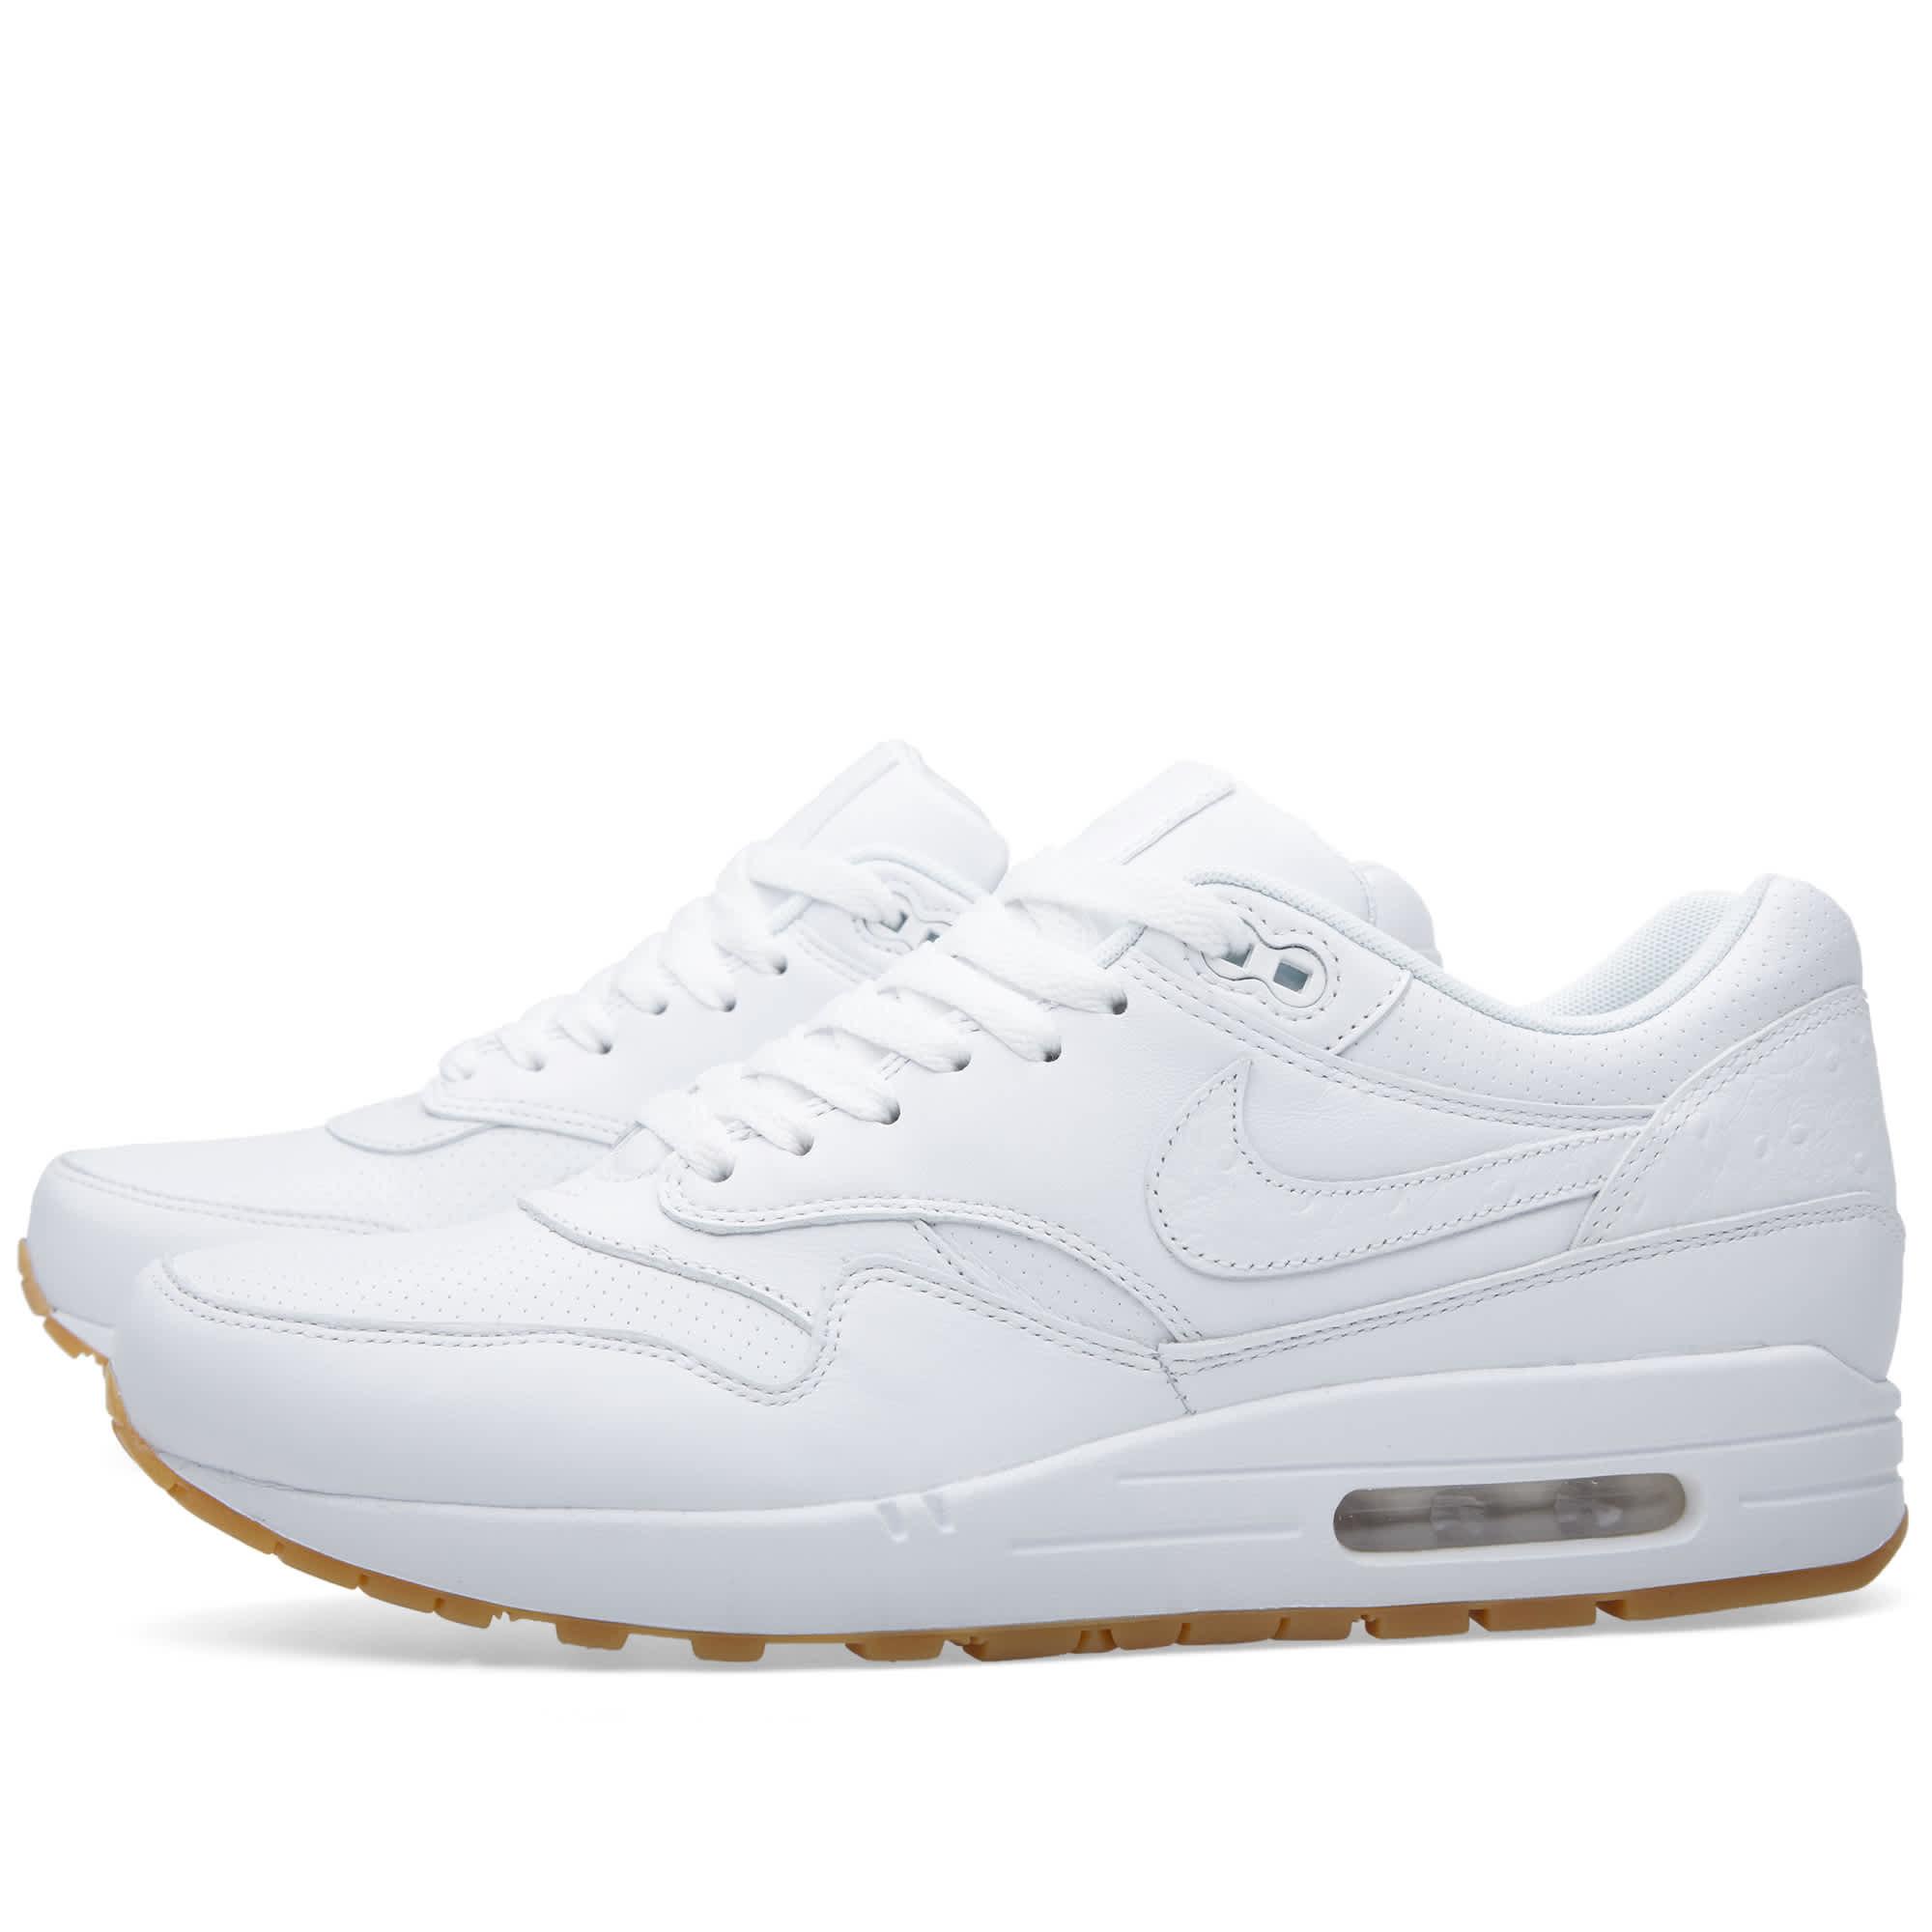 Nike Air Max 1 Leather PA White \u0026 Gum